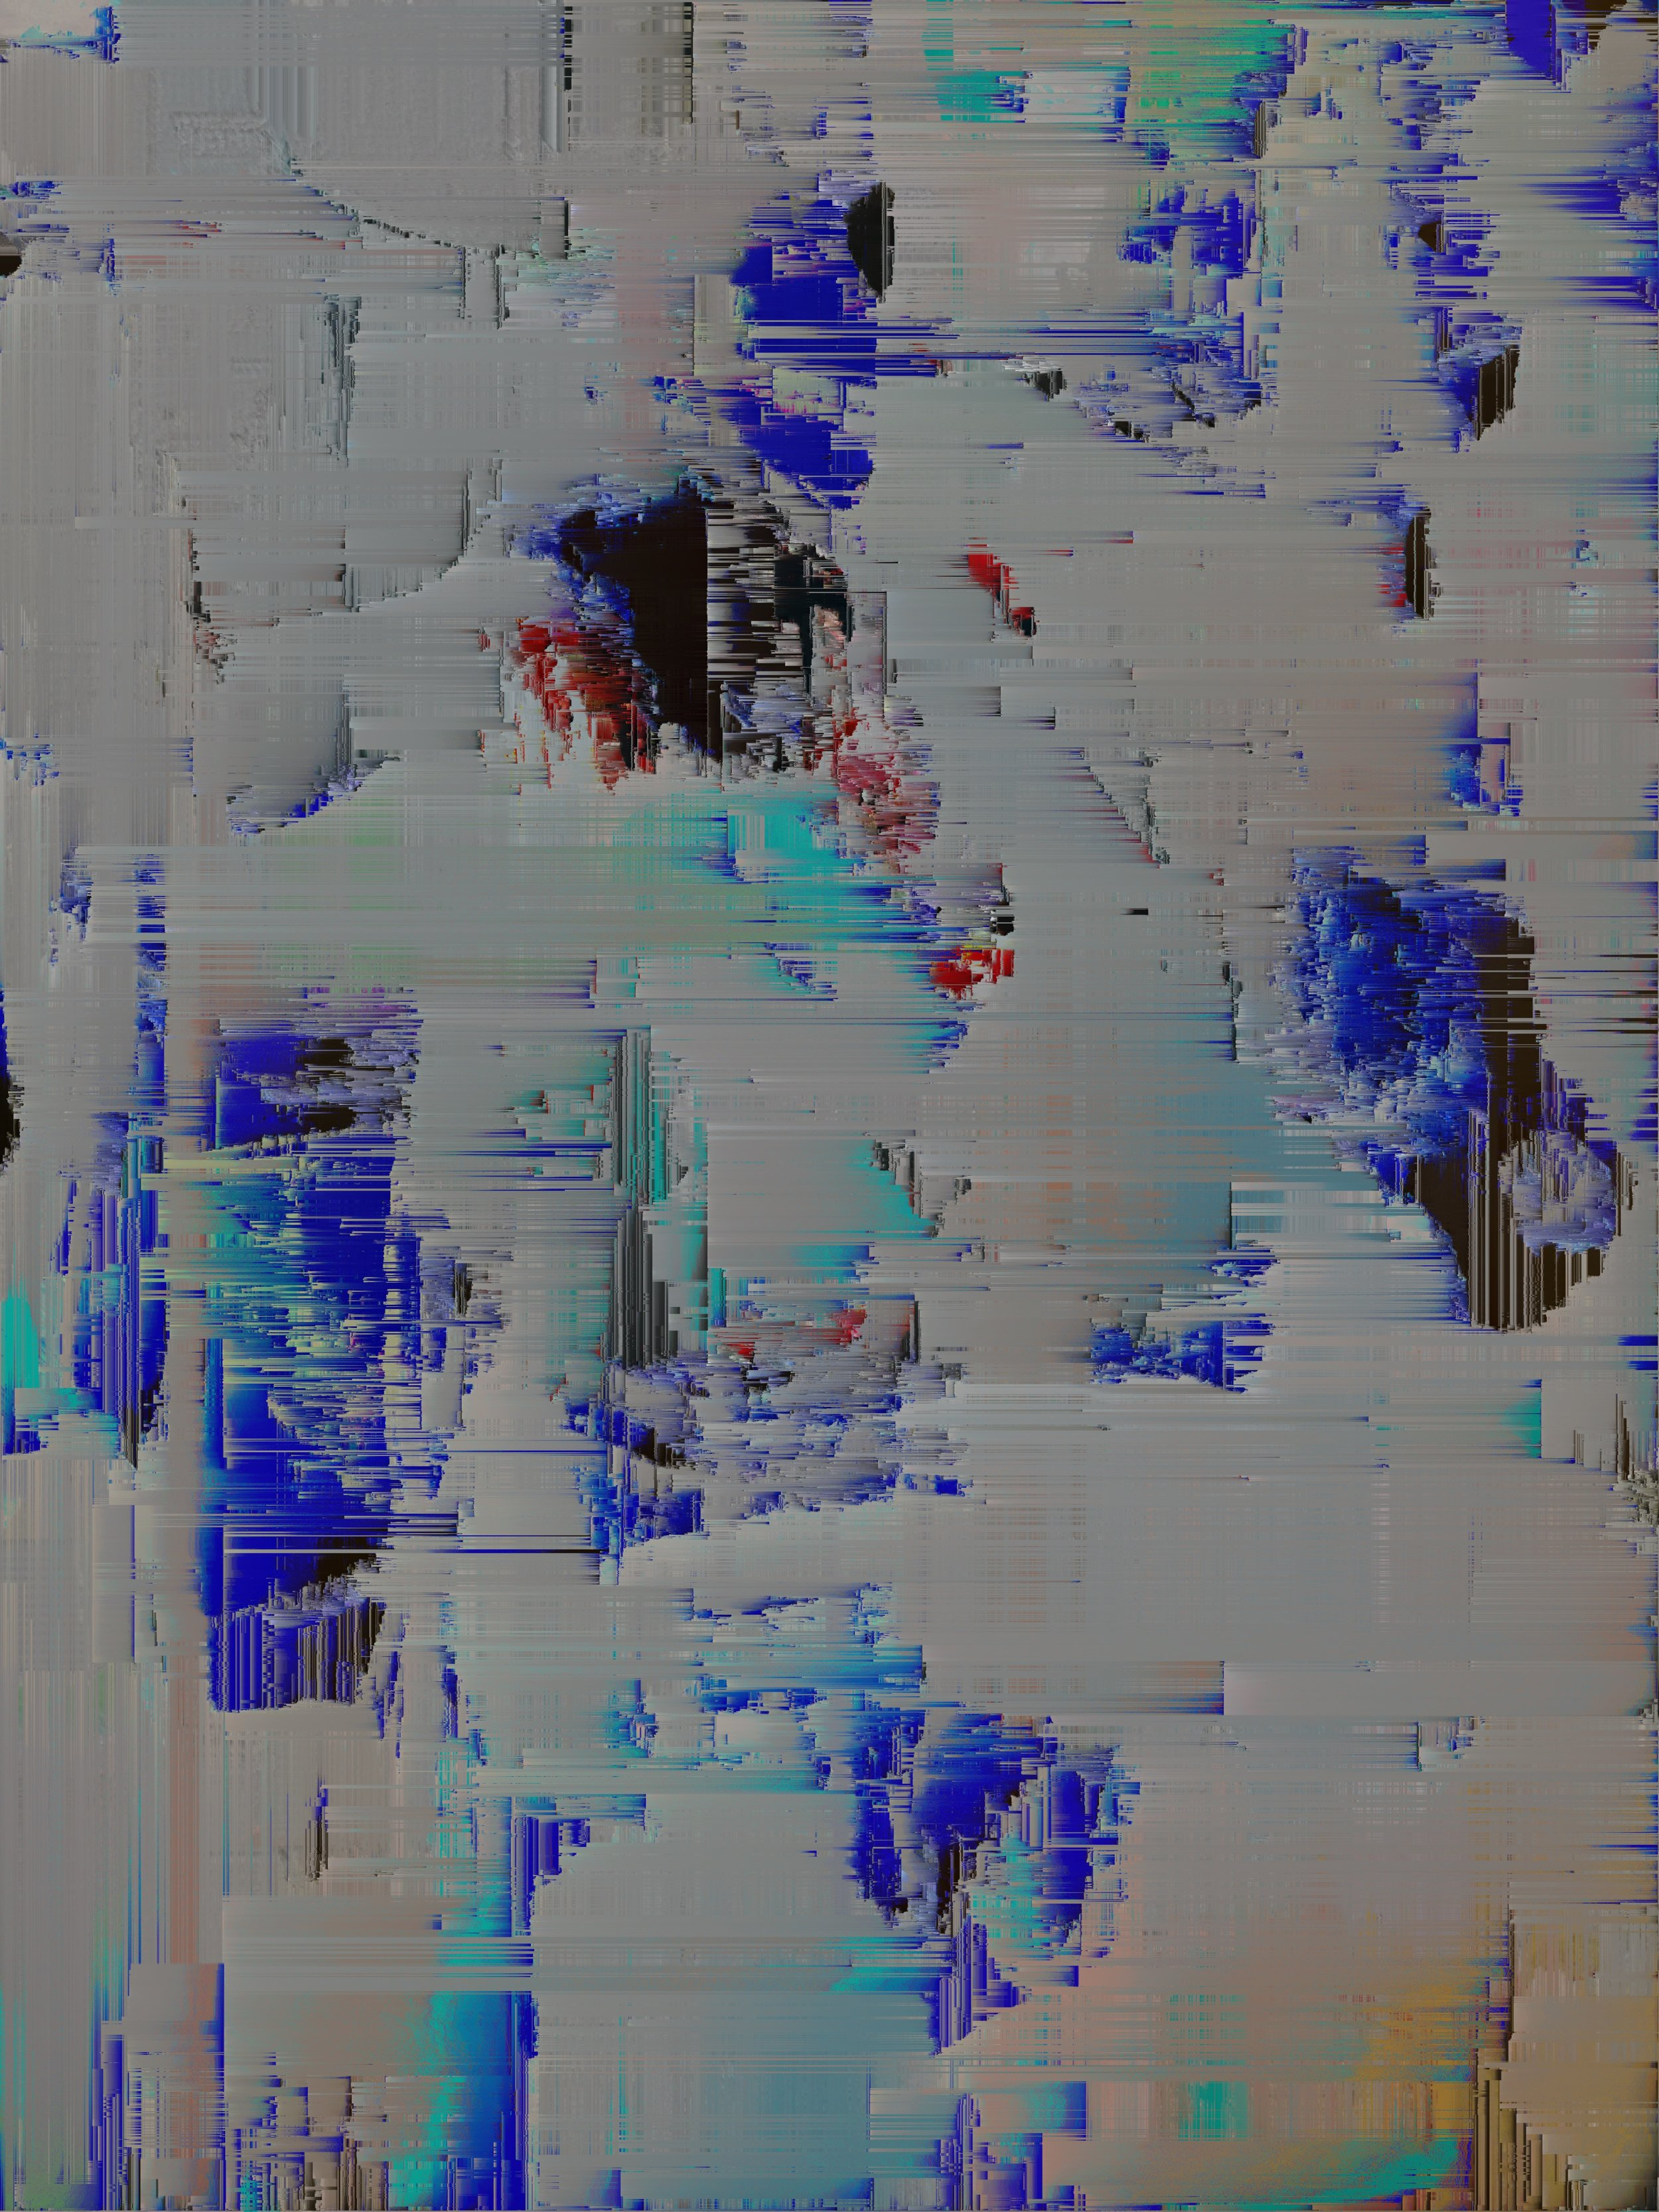 IMG_9703.JPG